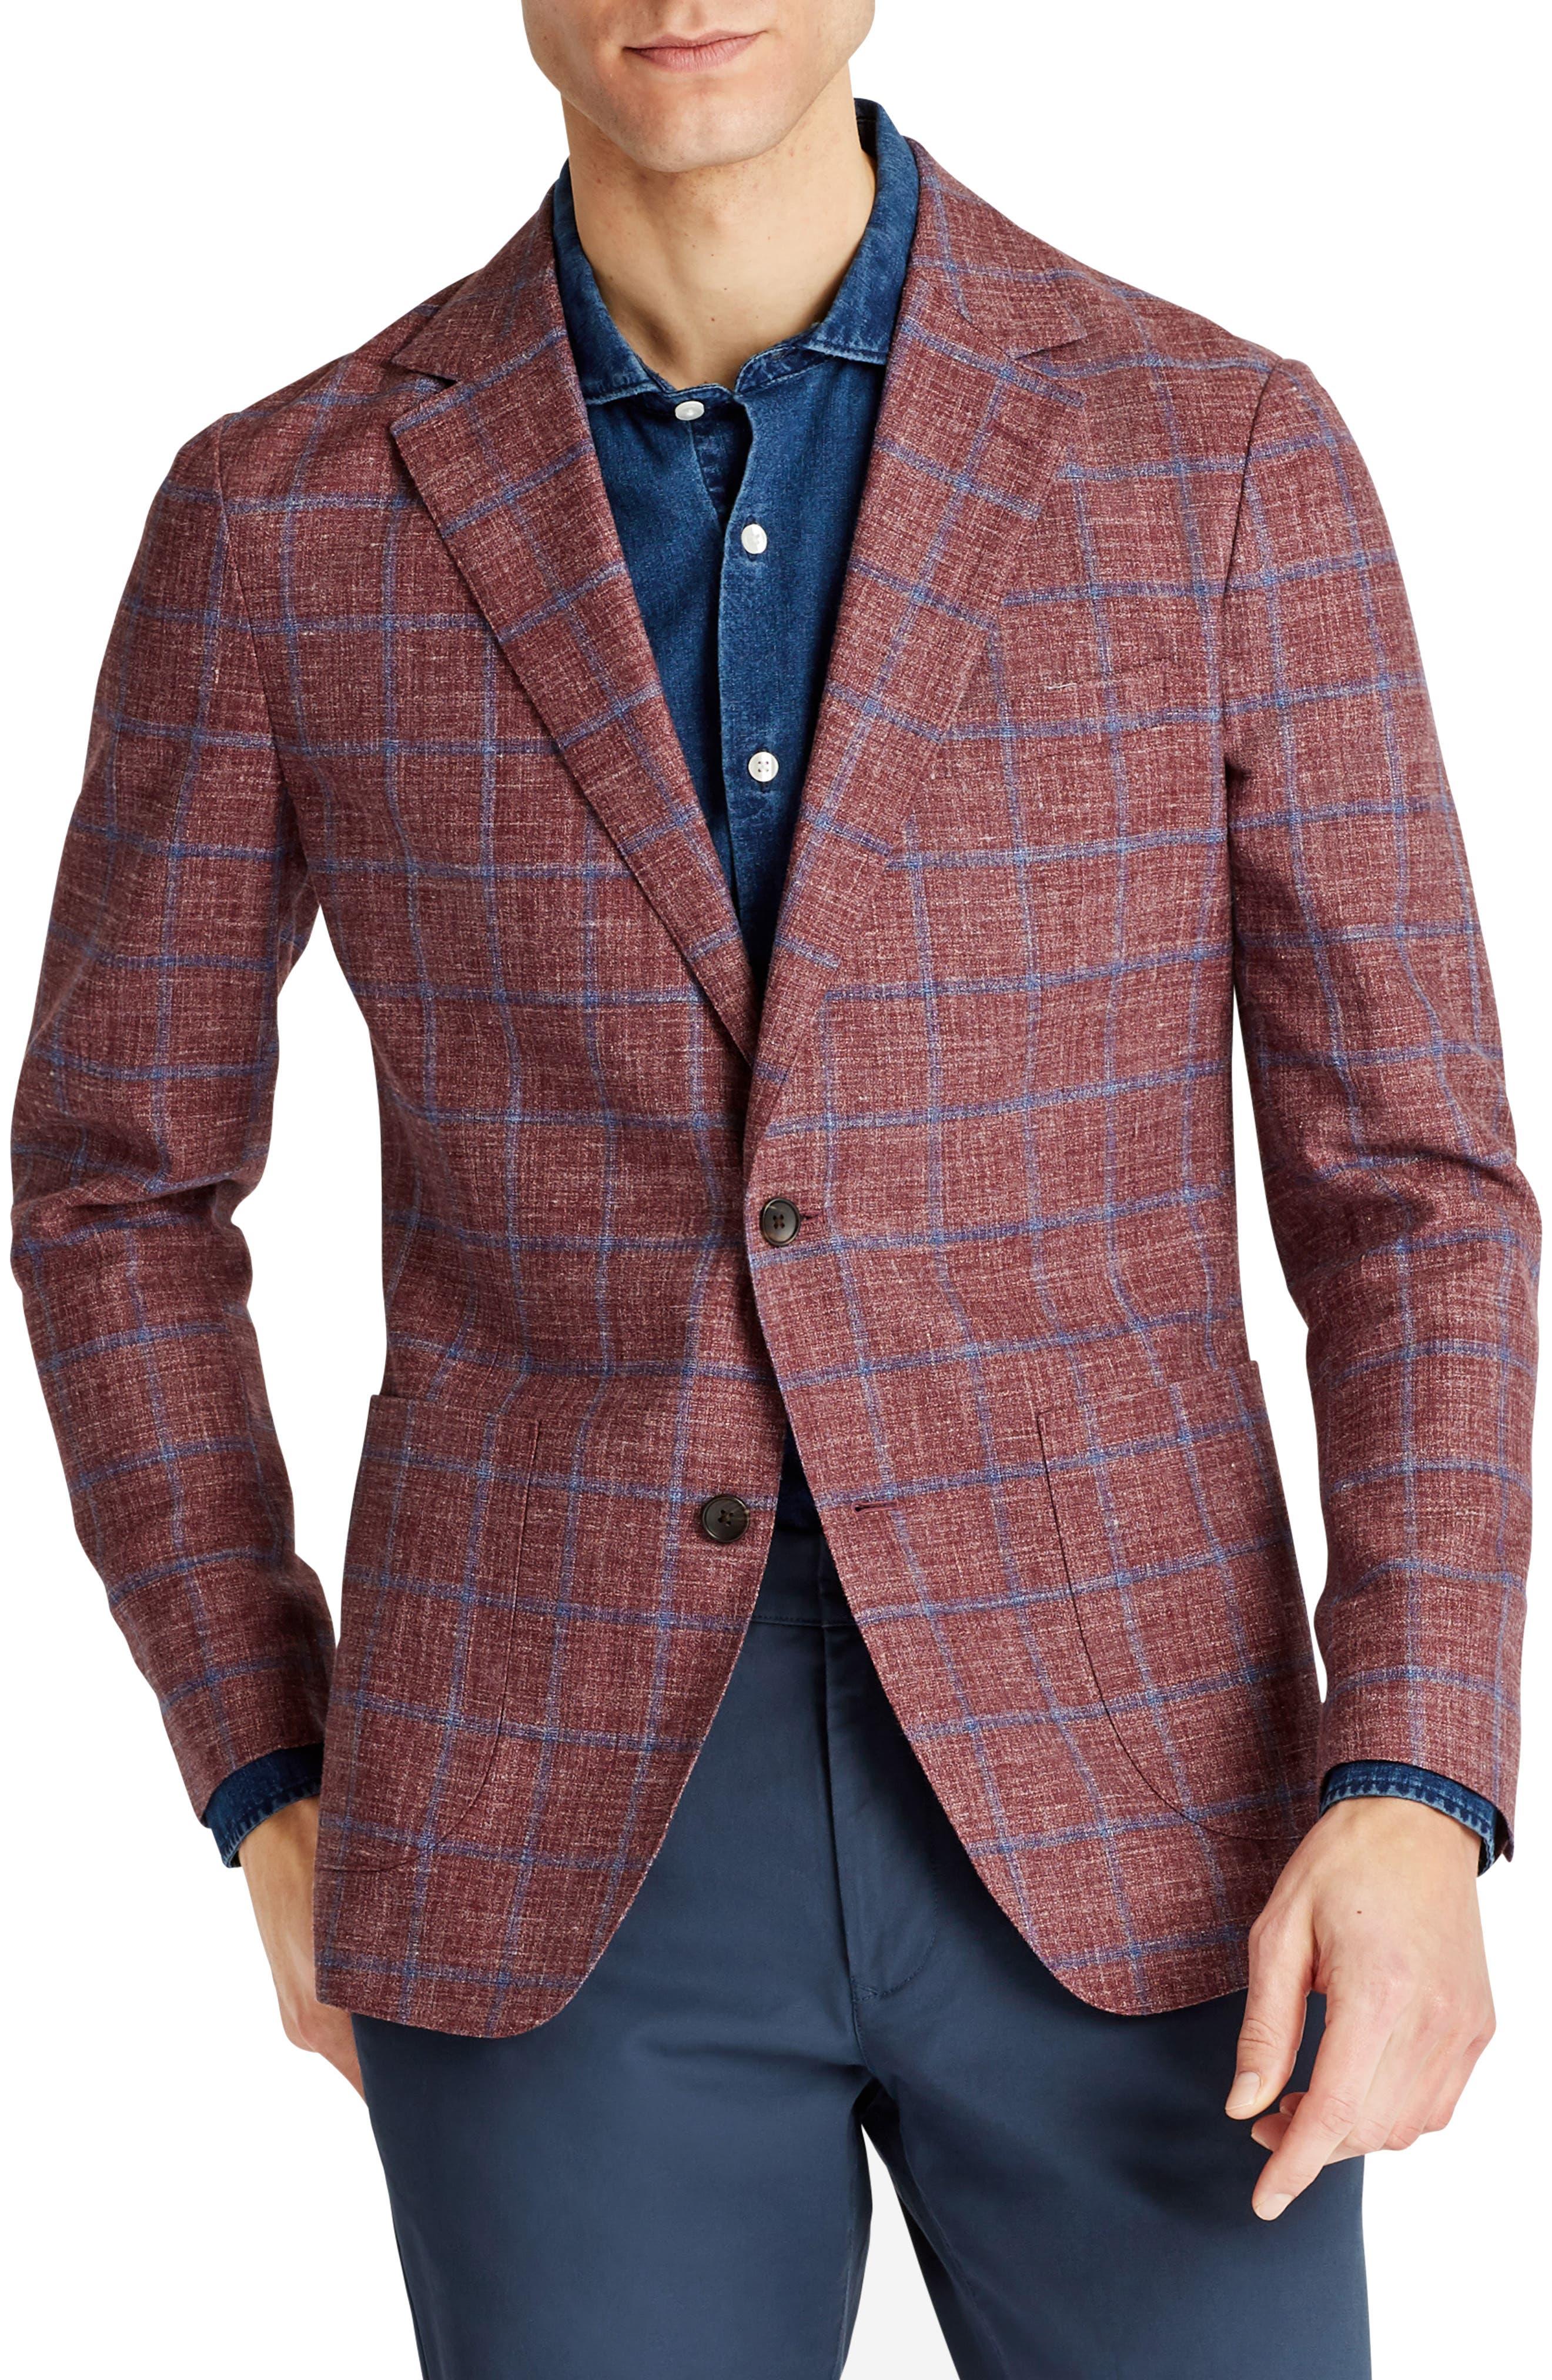 Capstone Slim Fit Windowpane Wool Blend Sport Coat,                             Main thumbnail 1, color,                             Red Plaid